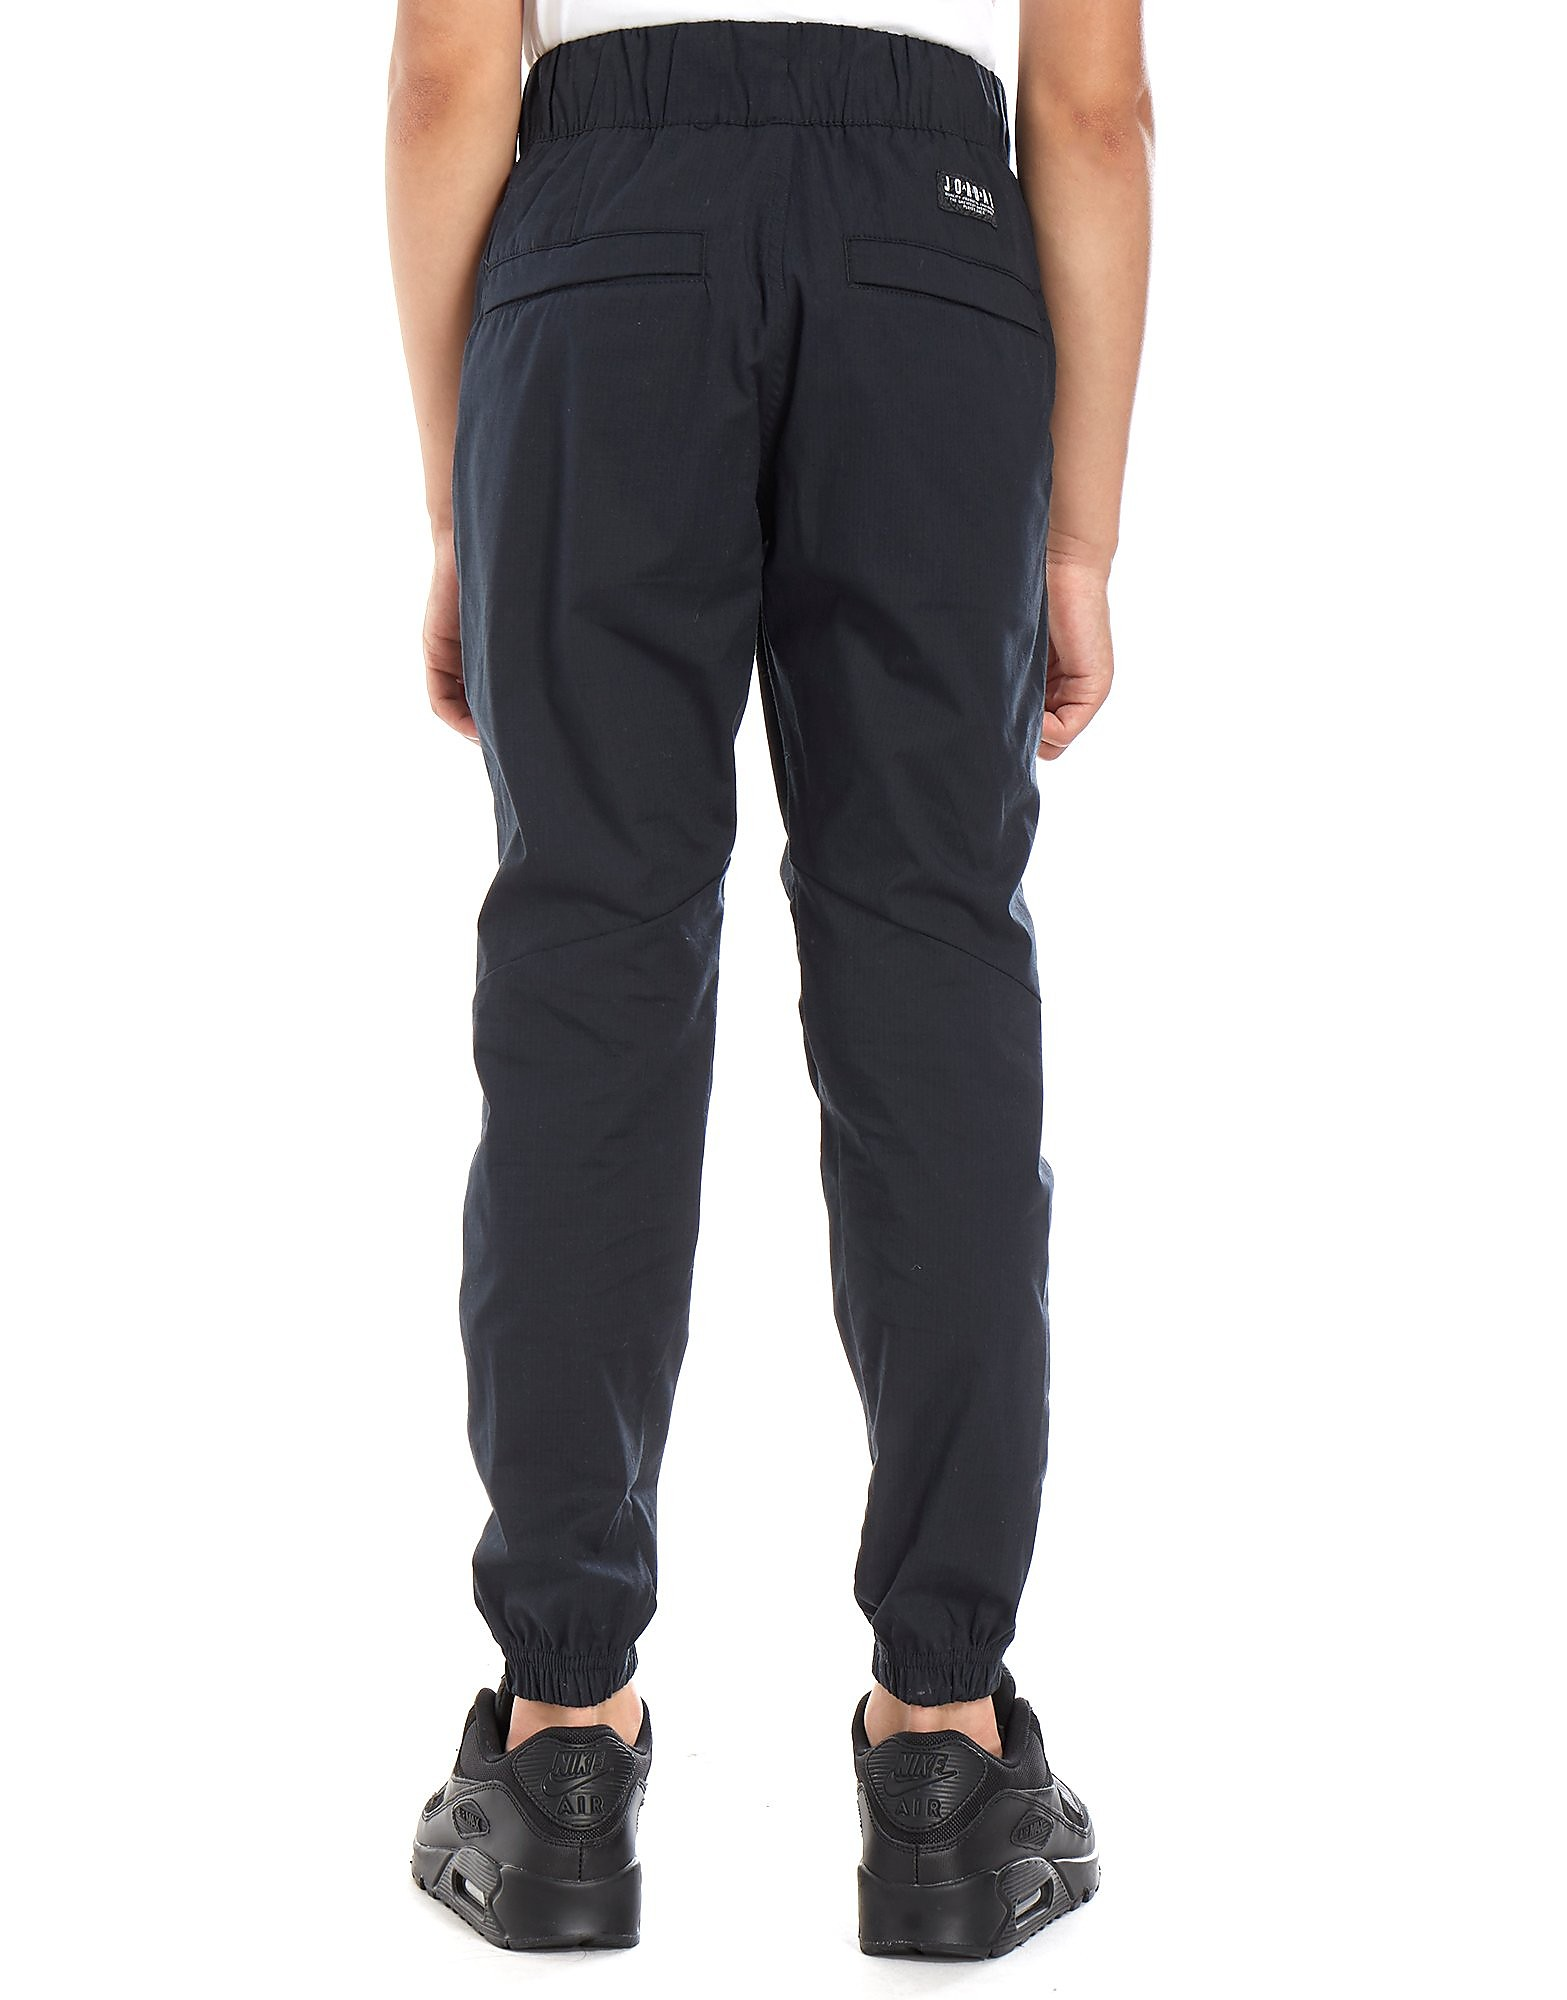 Jordan City Woven Track Pants Junior